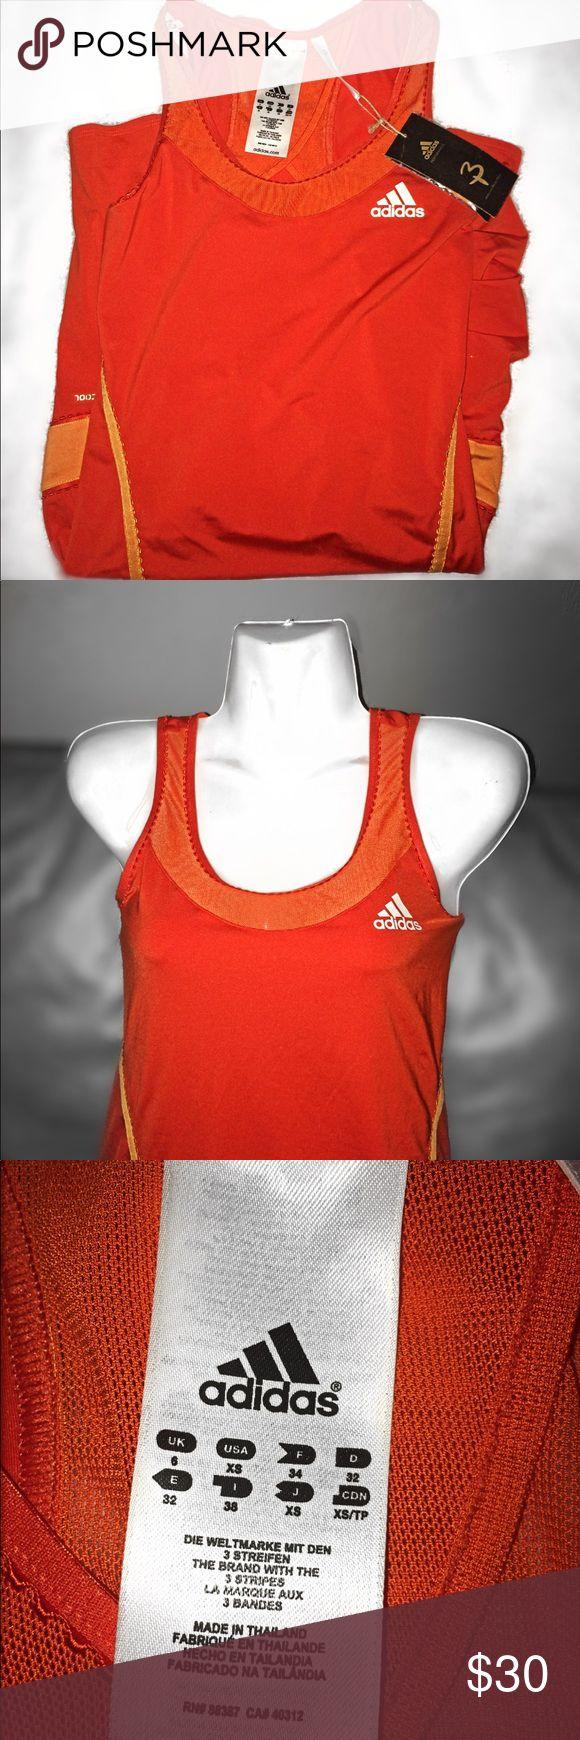 ✨Adidas Tennis Dress✨ Sporty Orange Tennis Dress. Ruching On Bottom Of Both Sides. White Adidas Logo. With A Lighter Orange. Never Worn. adidas Dresses